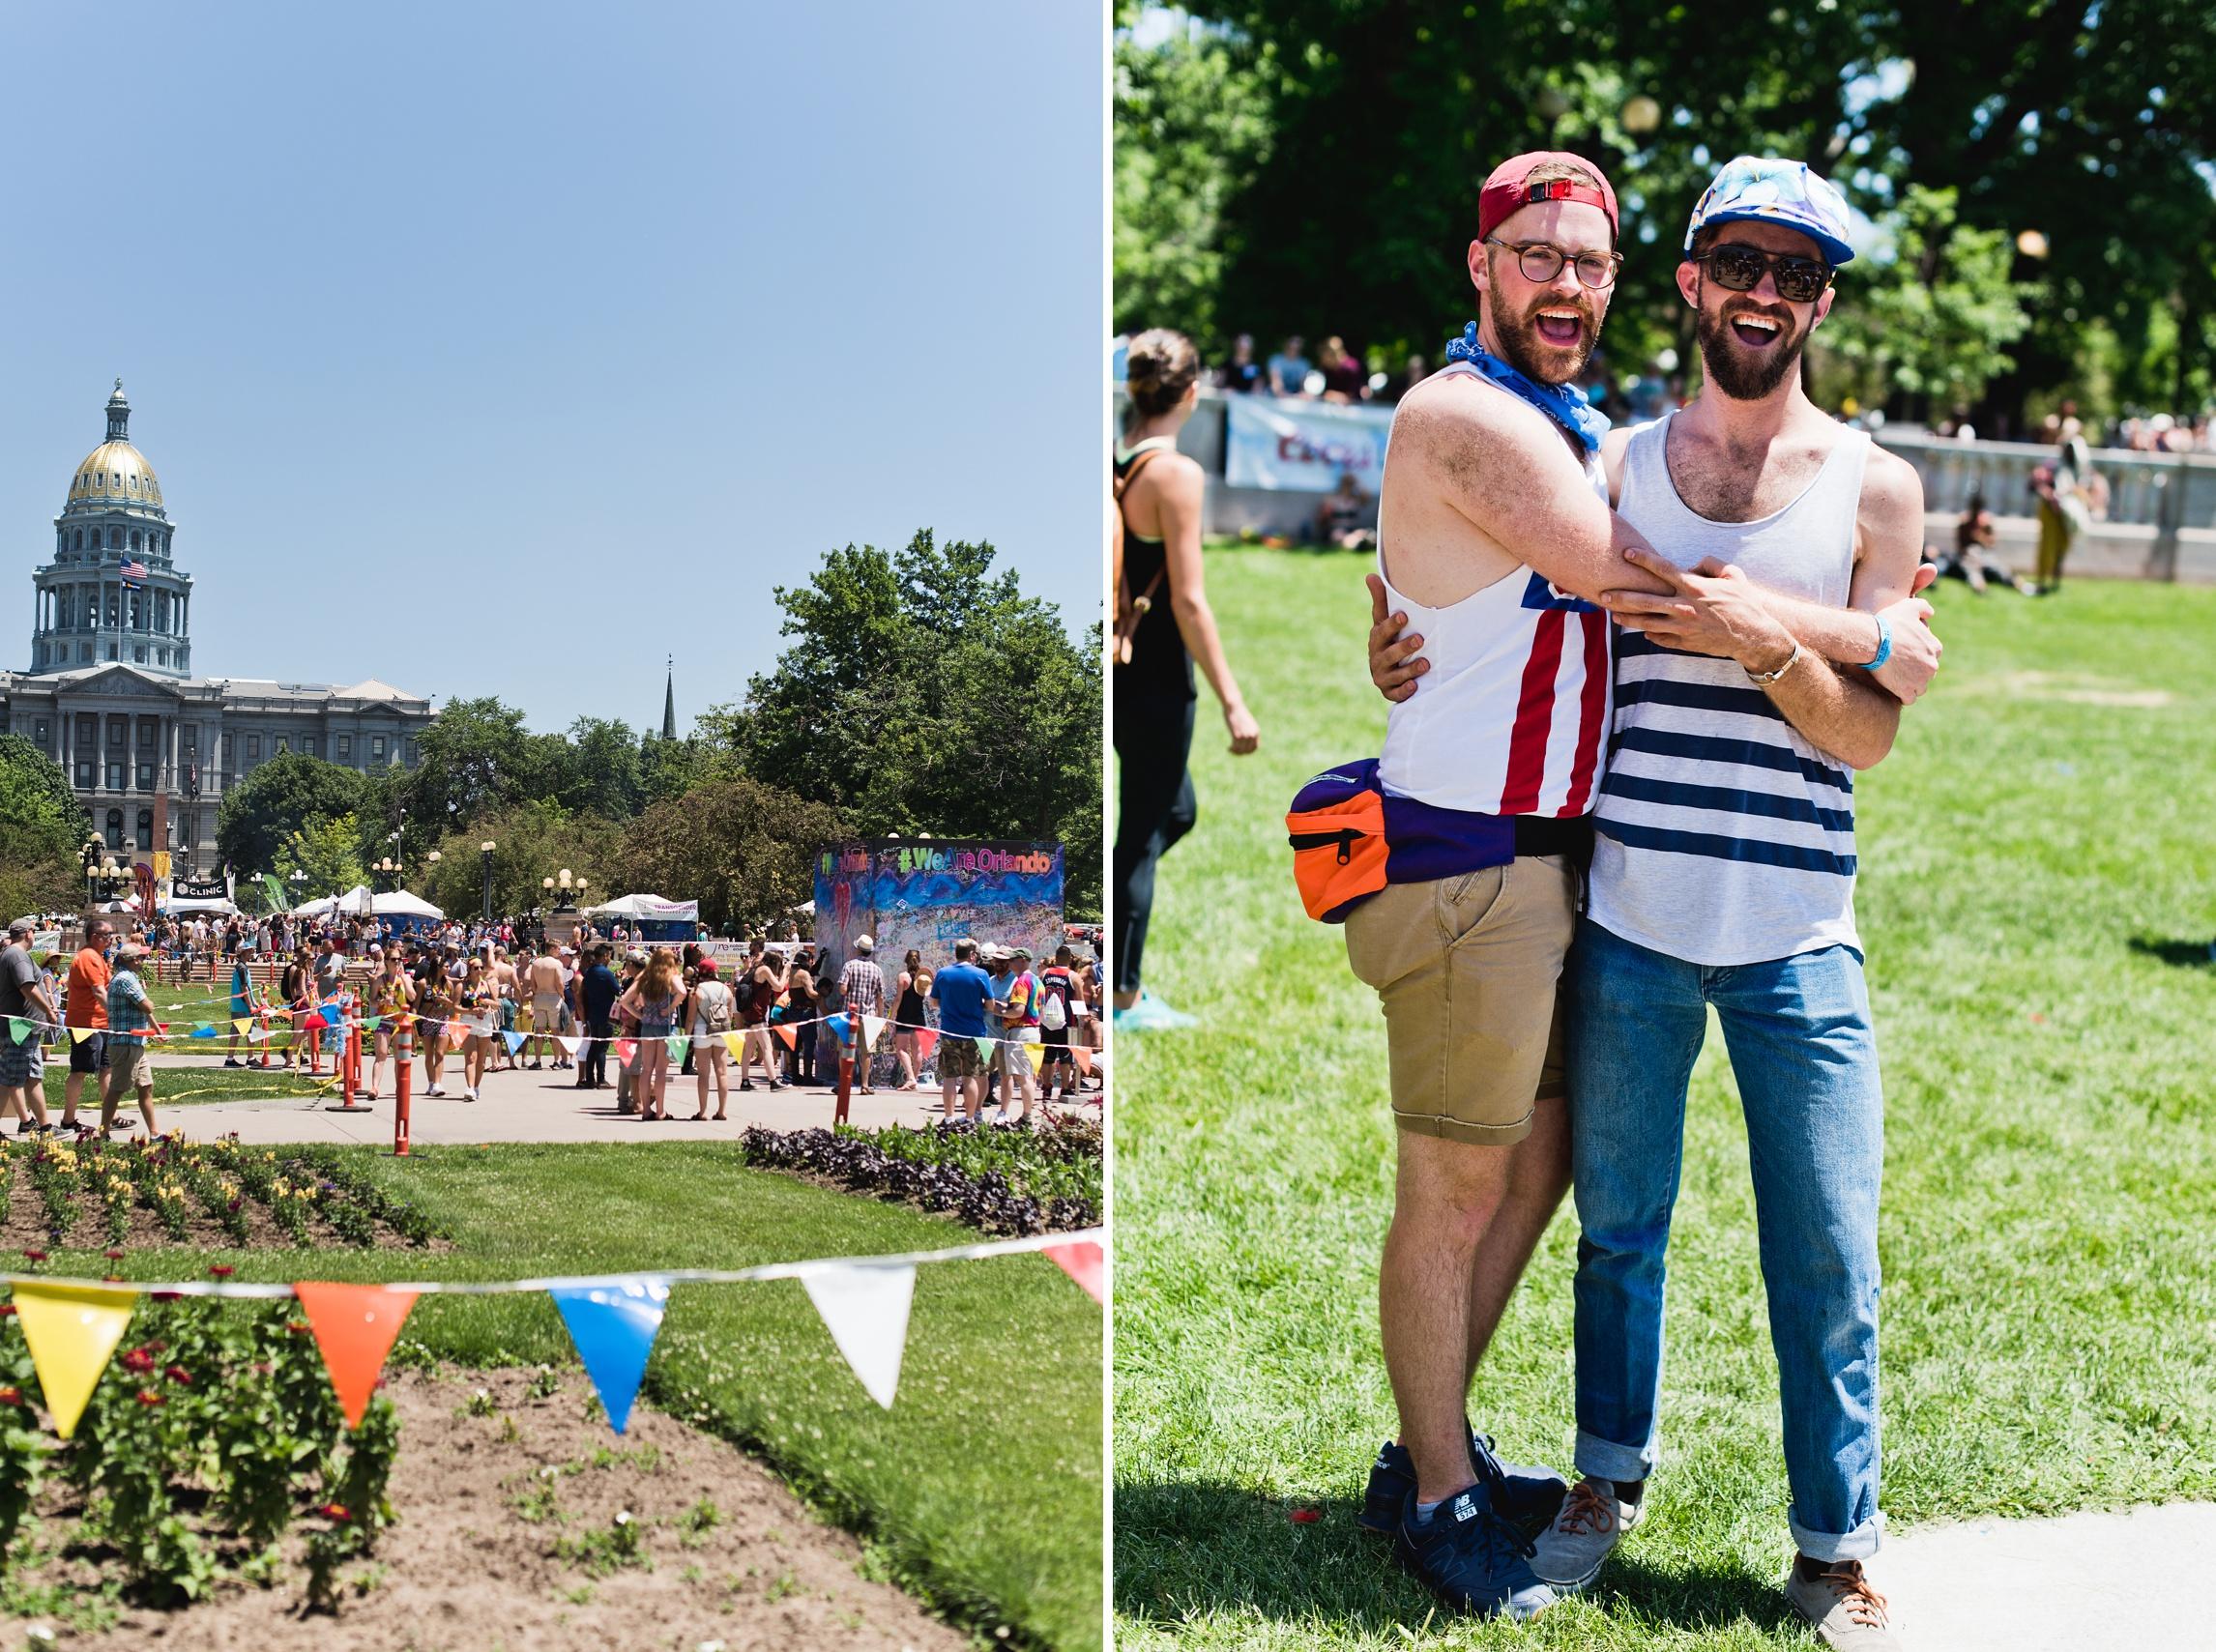 LGBT Pride parade in Denver, Colorado. Photography by Sonja Salzburg of Sonja K Photography.